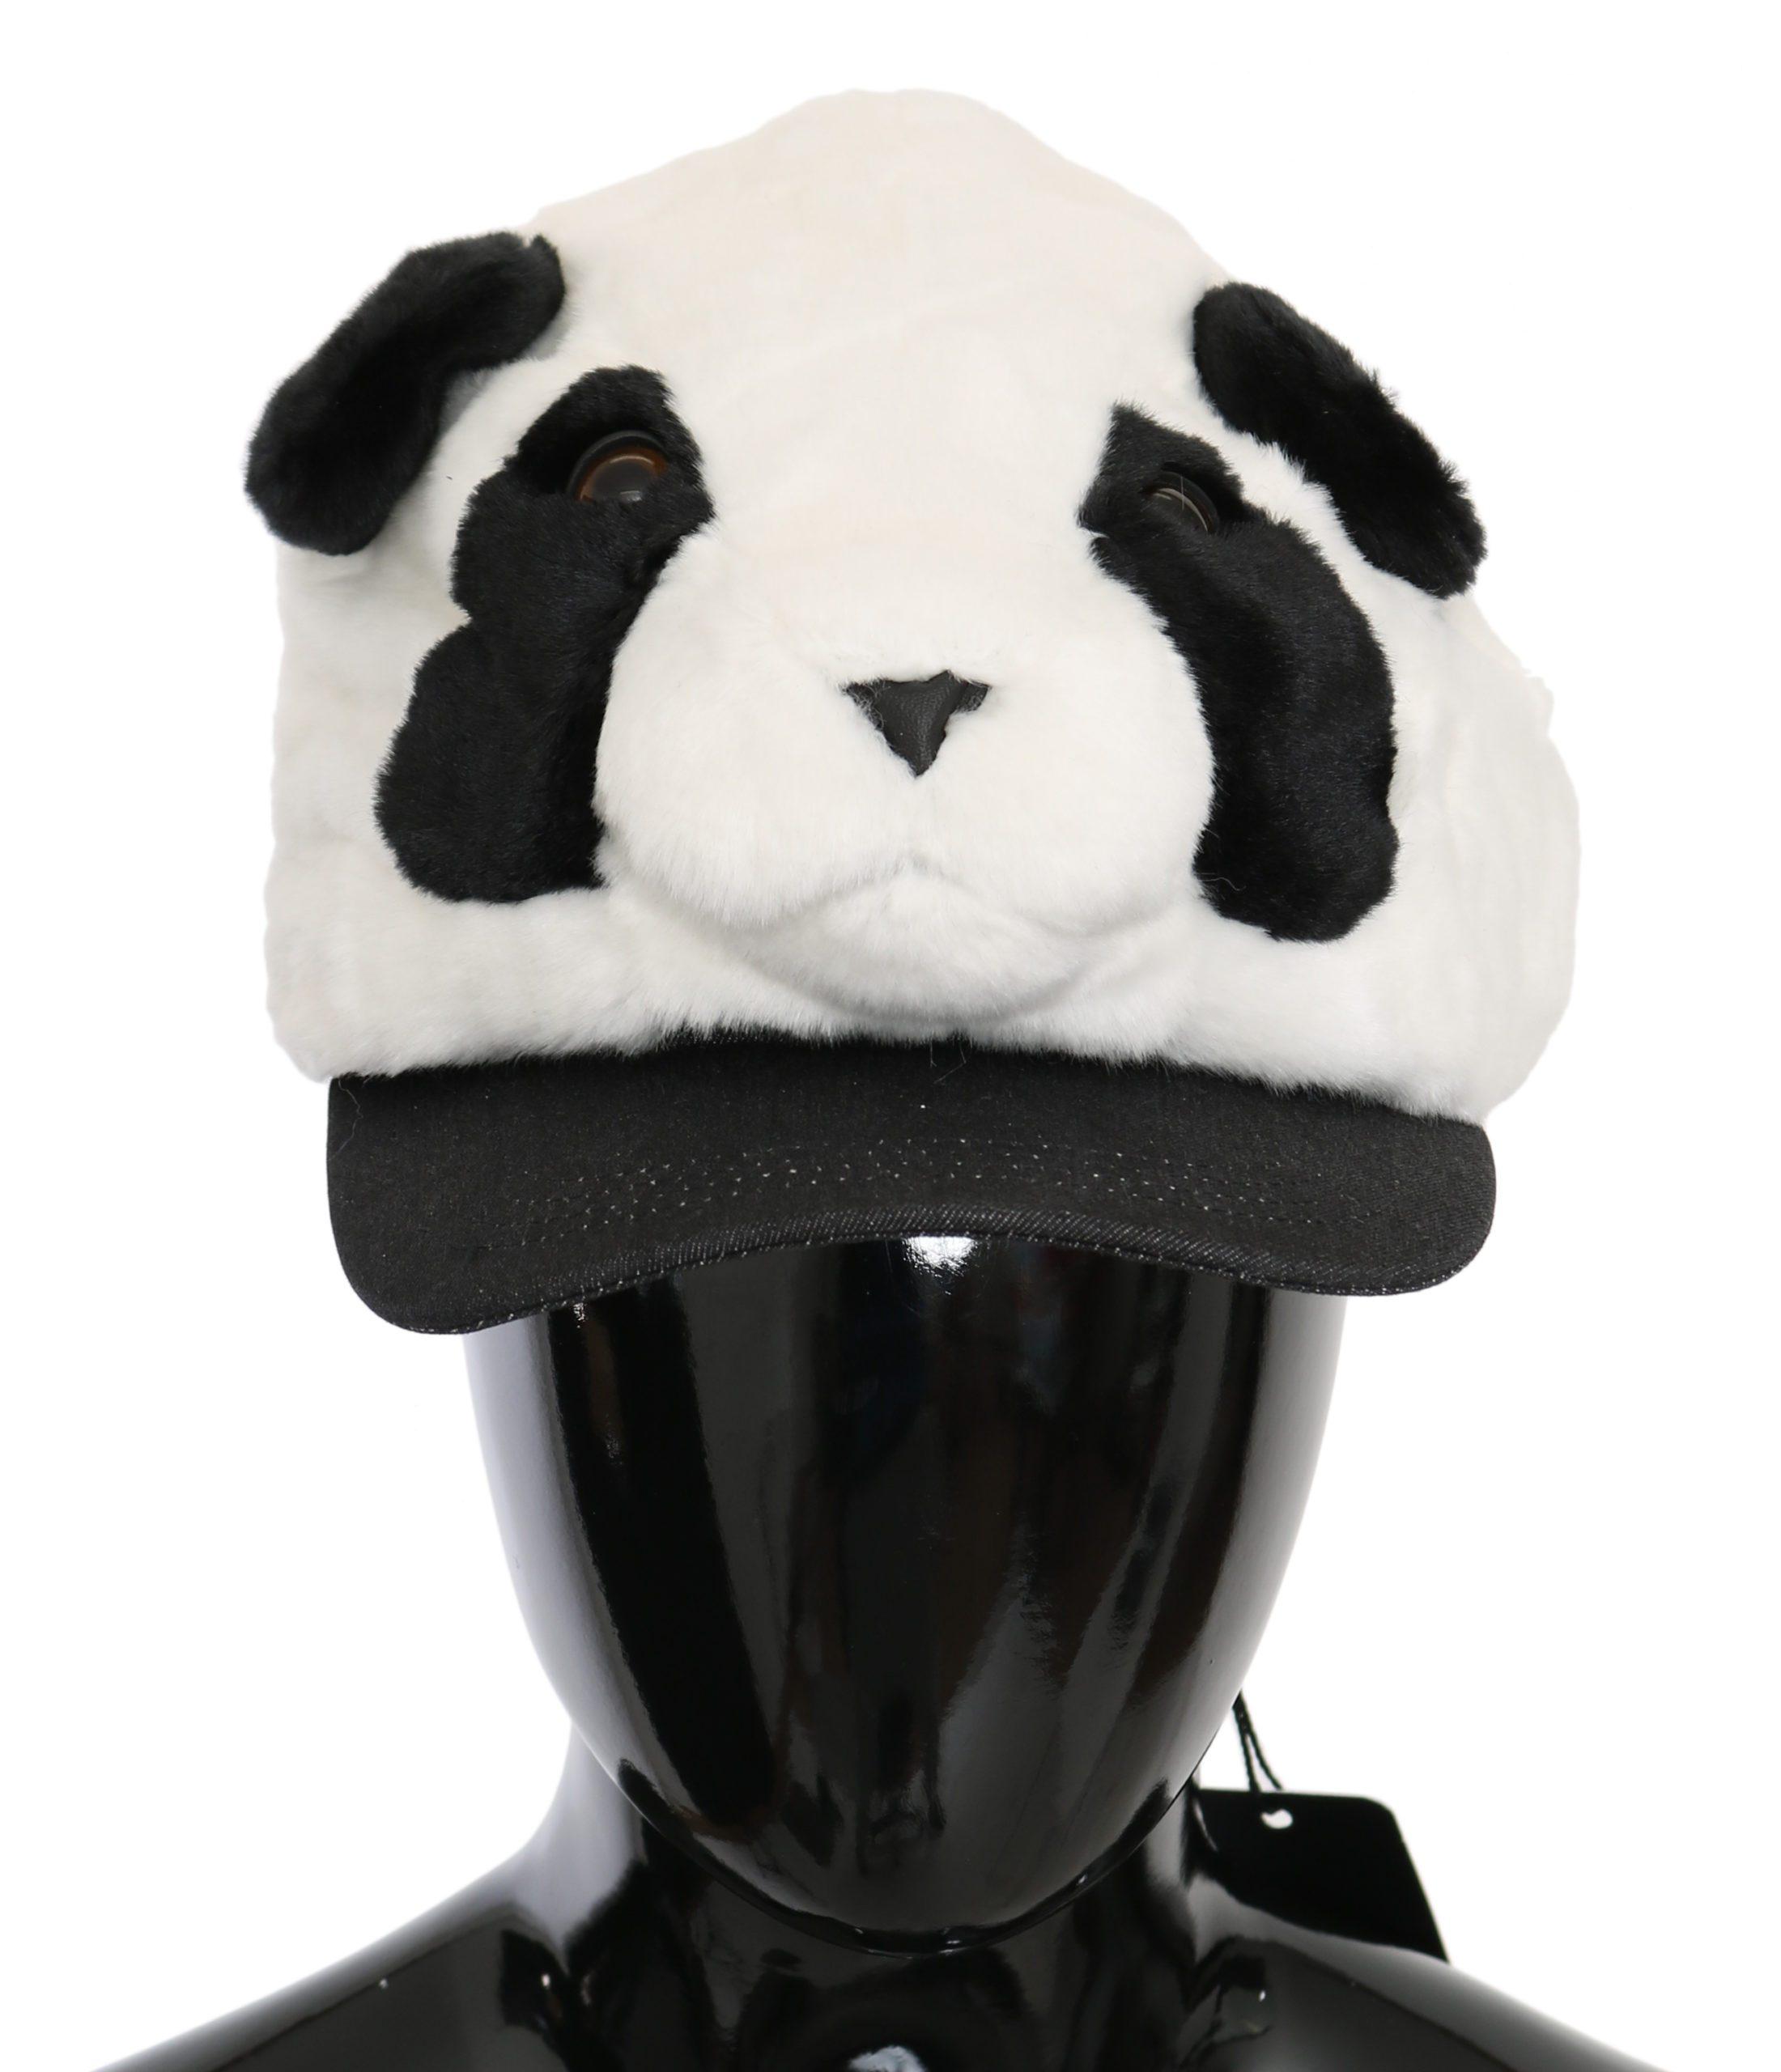 Dolce & Gabbana Women's Panda Fur Baseball Cotton Hat Multicolor HAT9085 - 57 cm|S